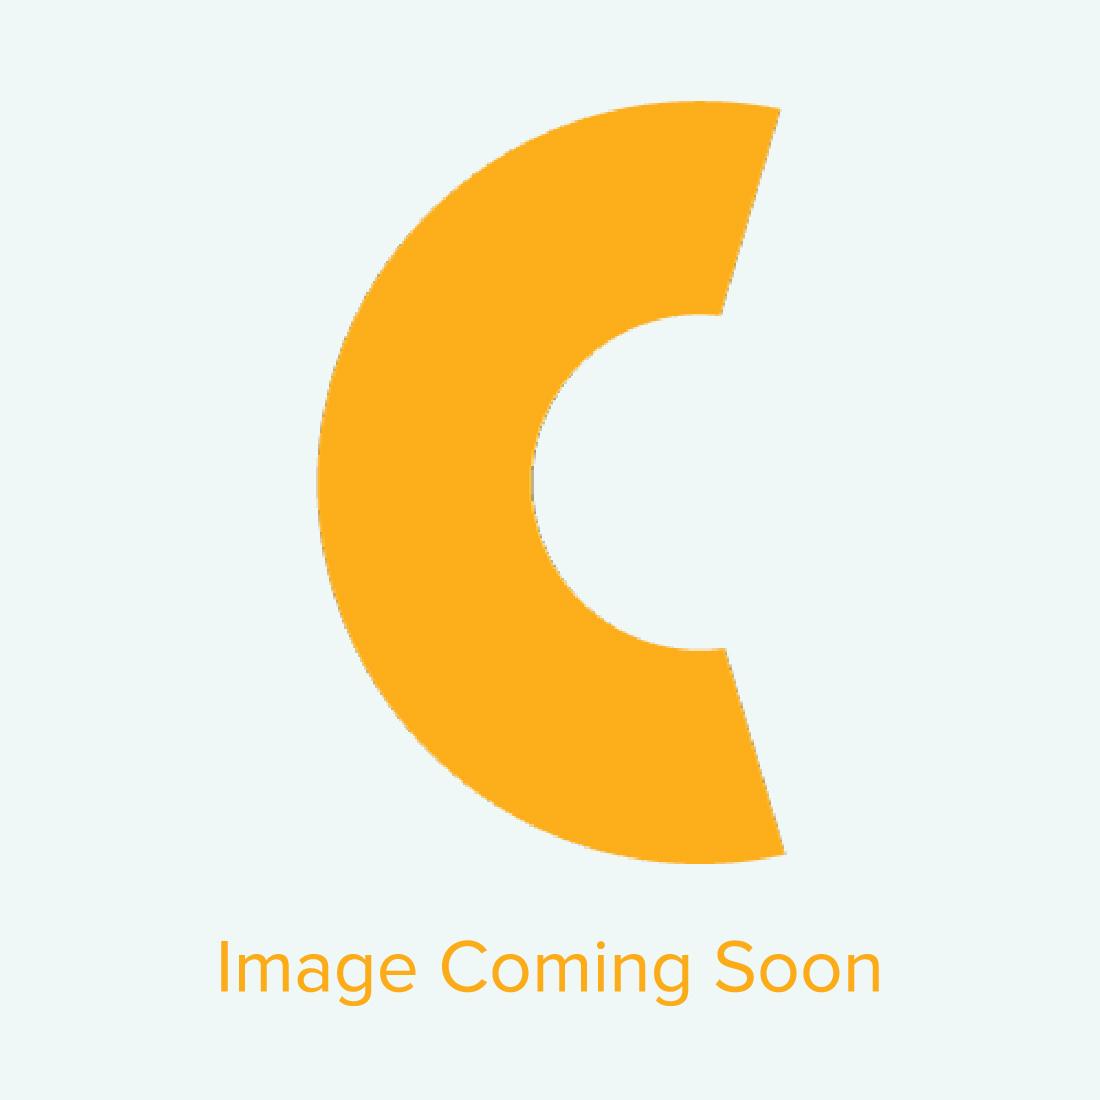 OKI Data C831TS Replacement Toner Cartridges